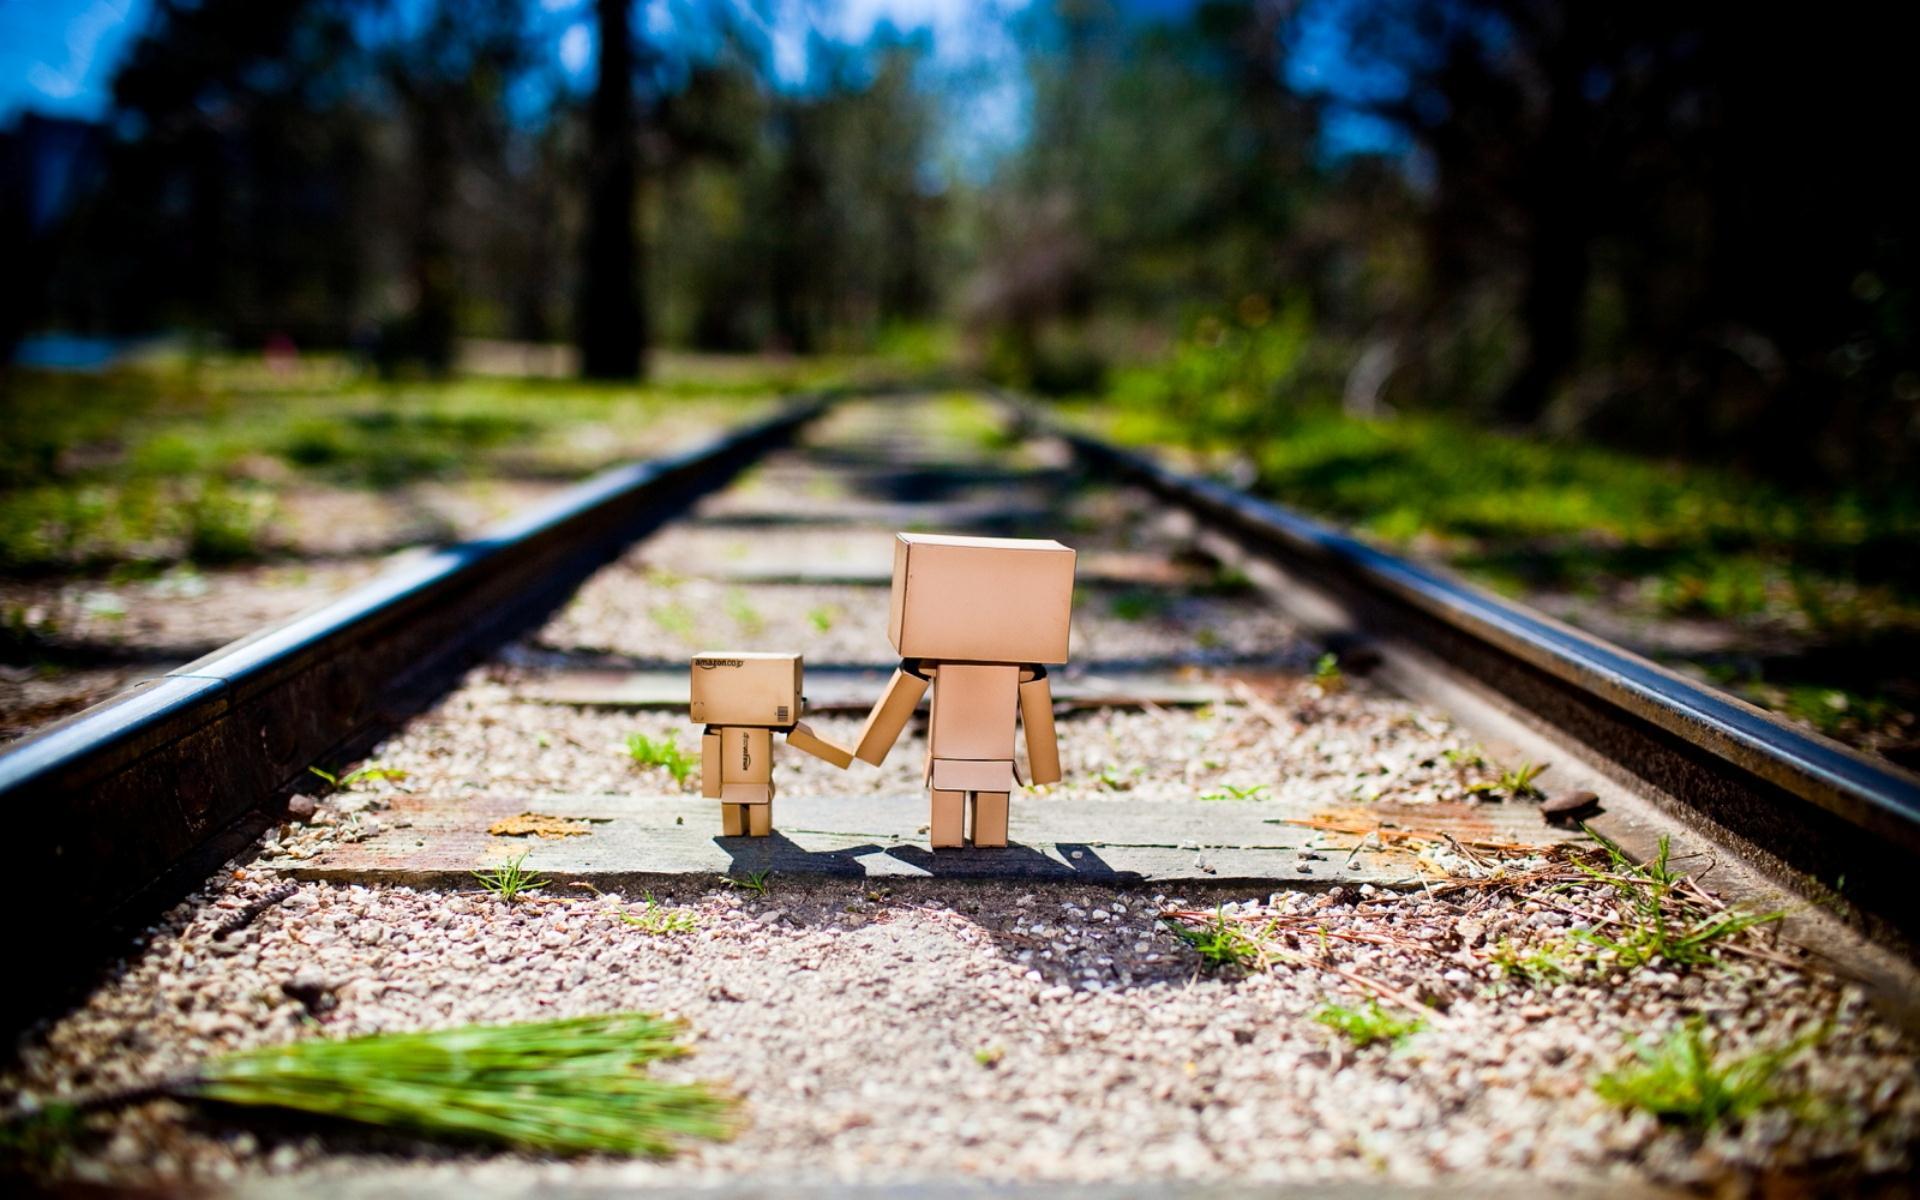 Robot Cardboard Together Railroads